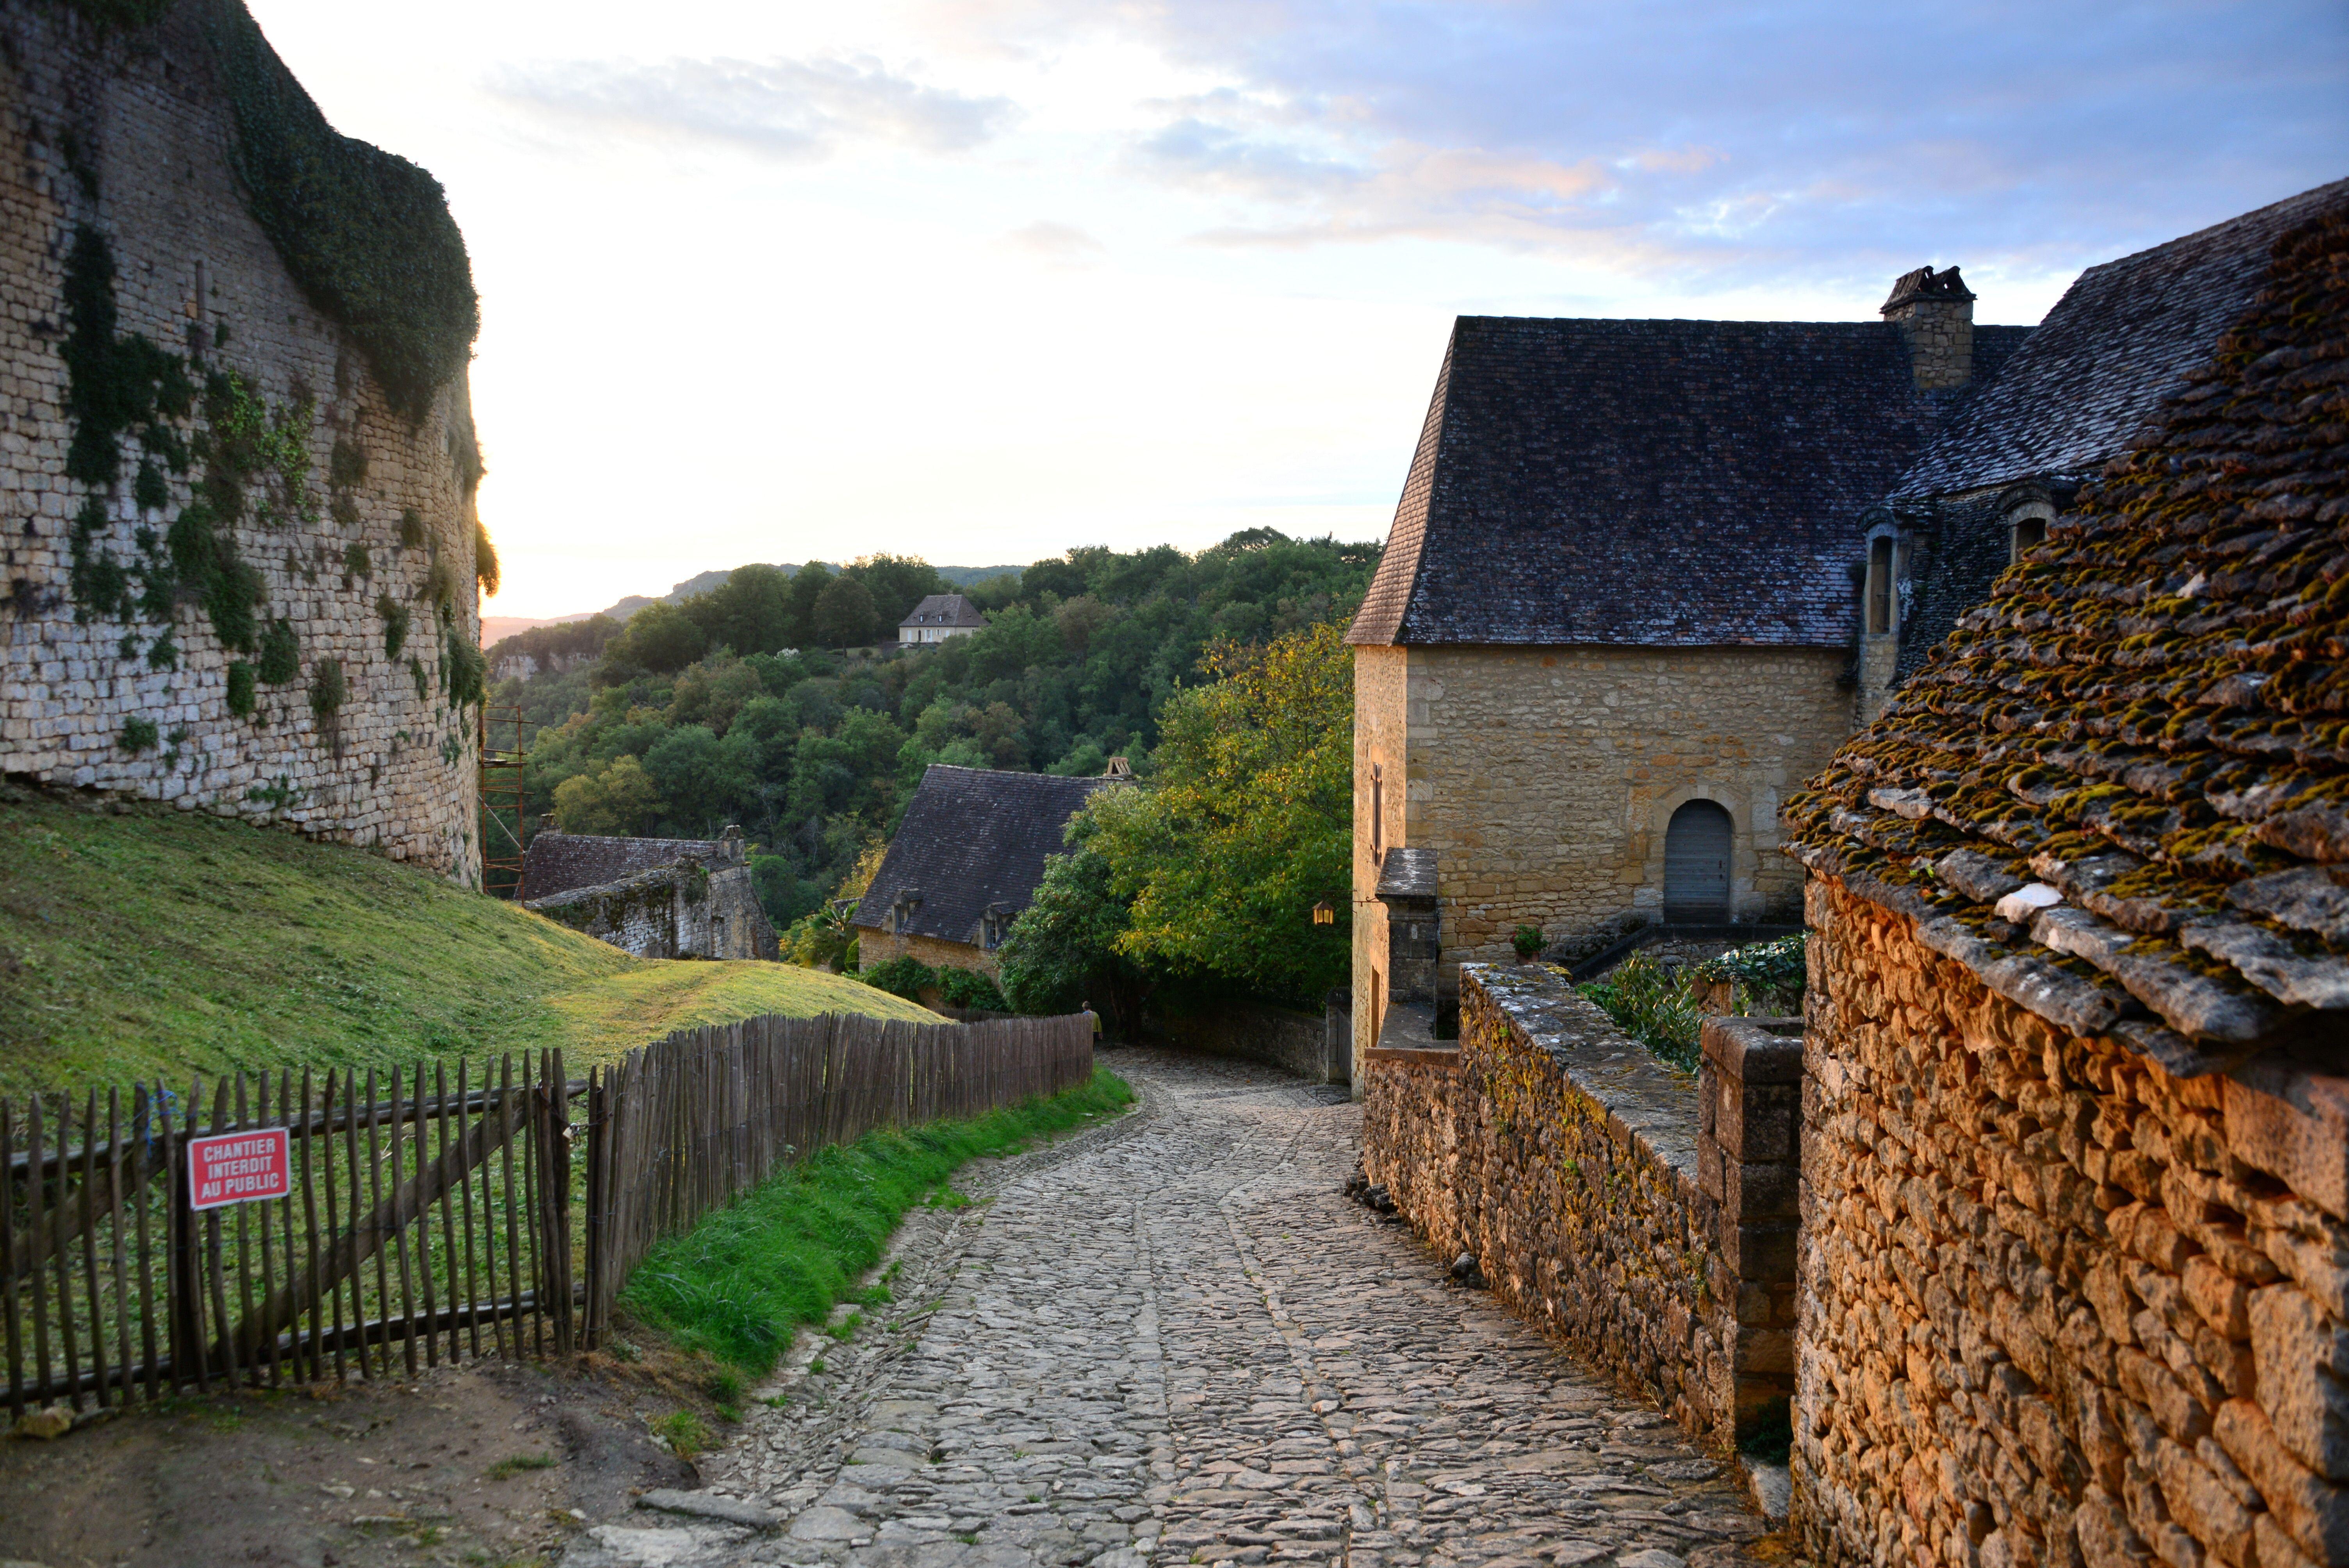 In Beynac-et-Cazenac in the Dordogne valley, Perigord, Dordogne, Aquitaine, West-France, France